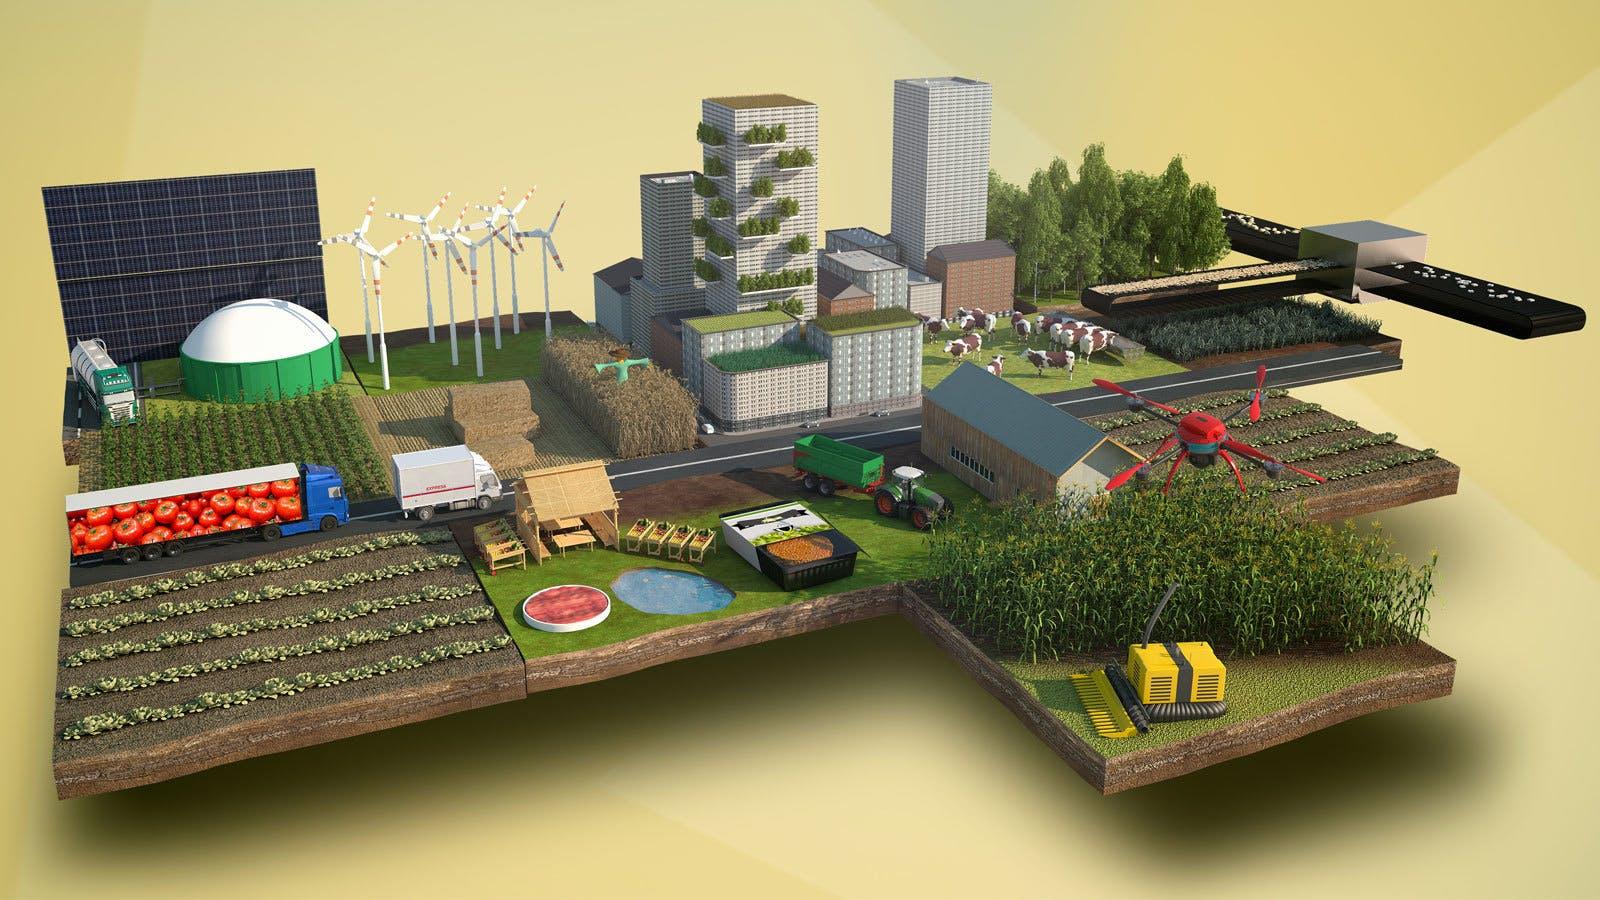 Boerenbond farming of the future